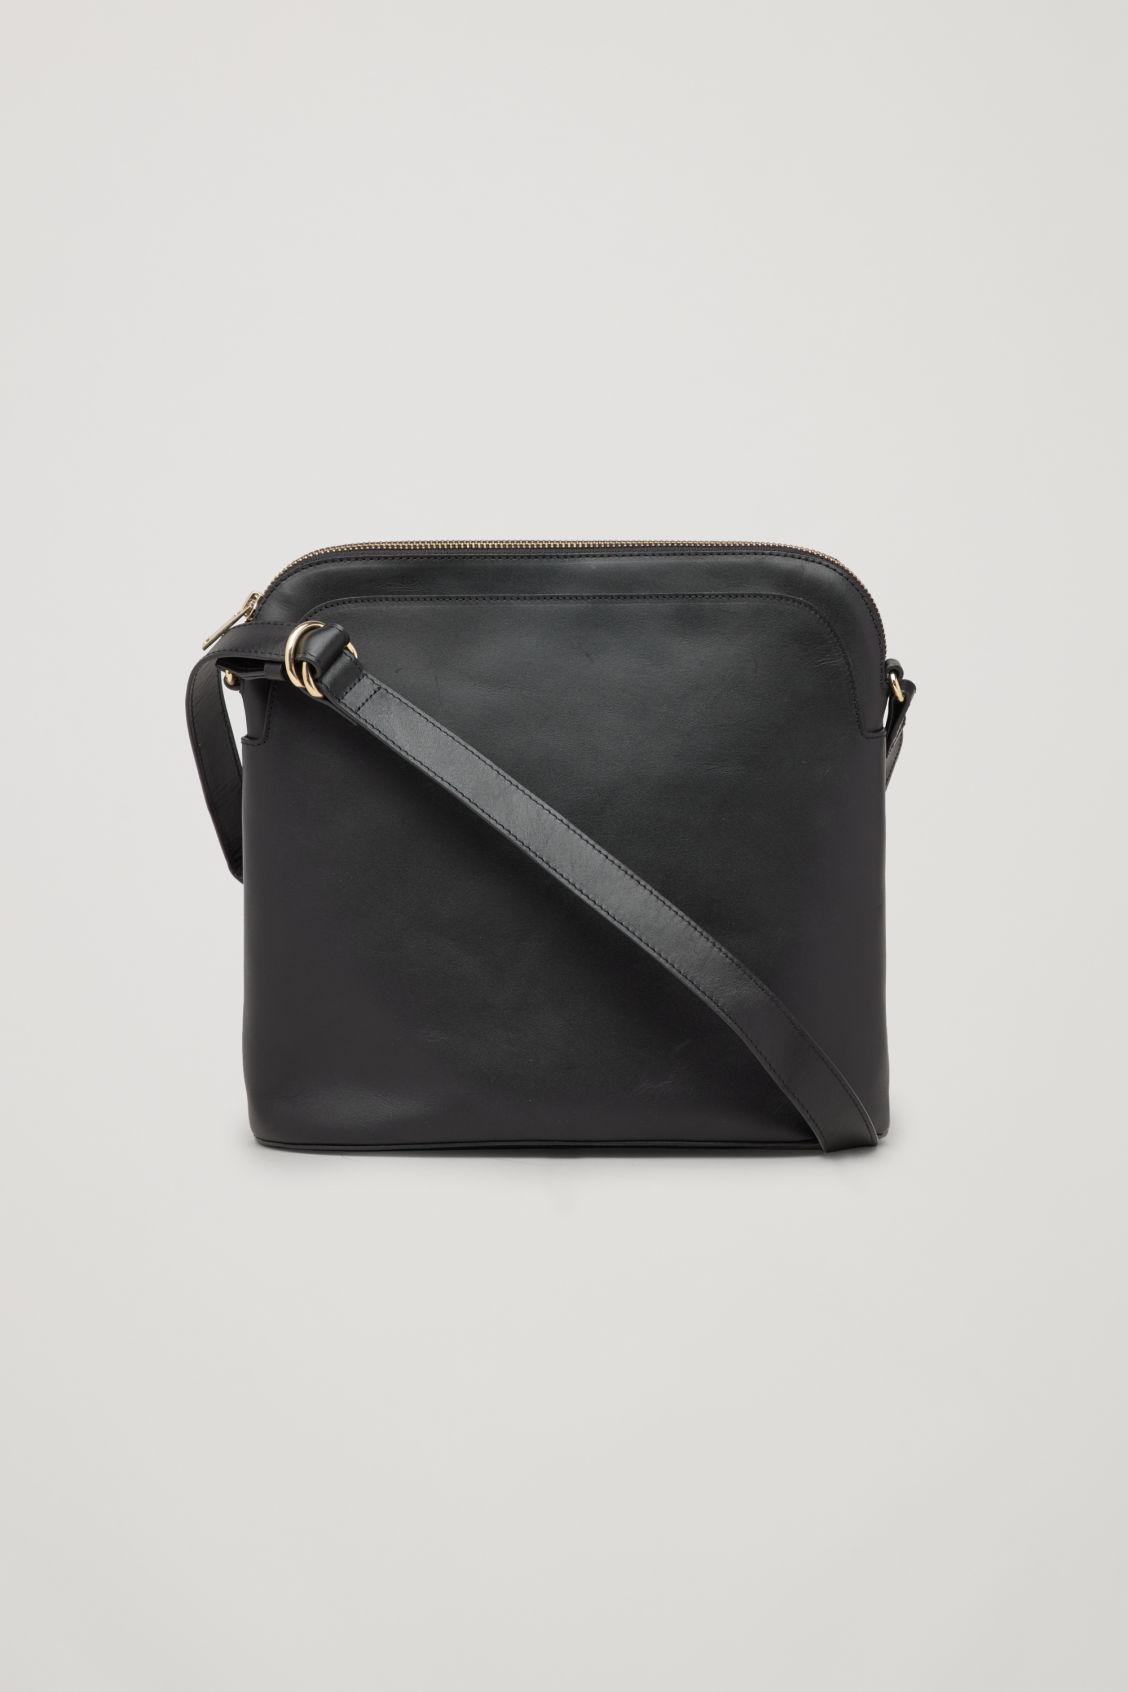 Cos Women S Black Medium Leather Crossbody Bag